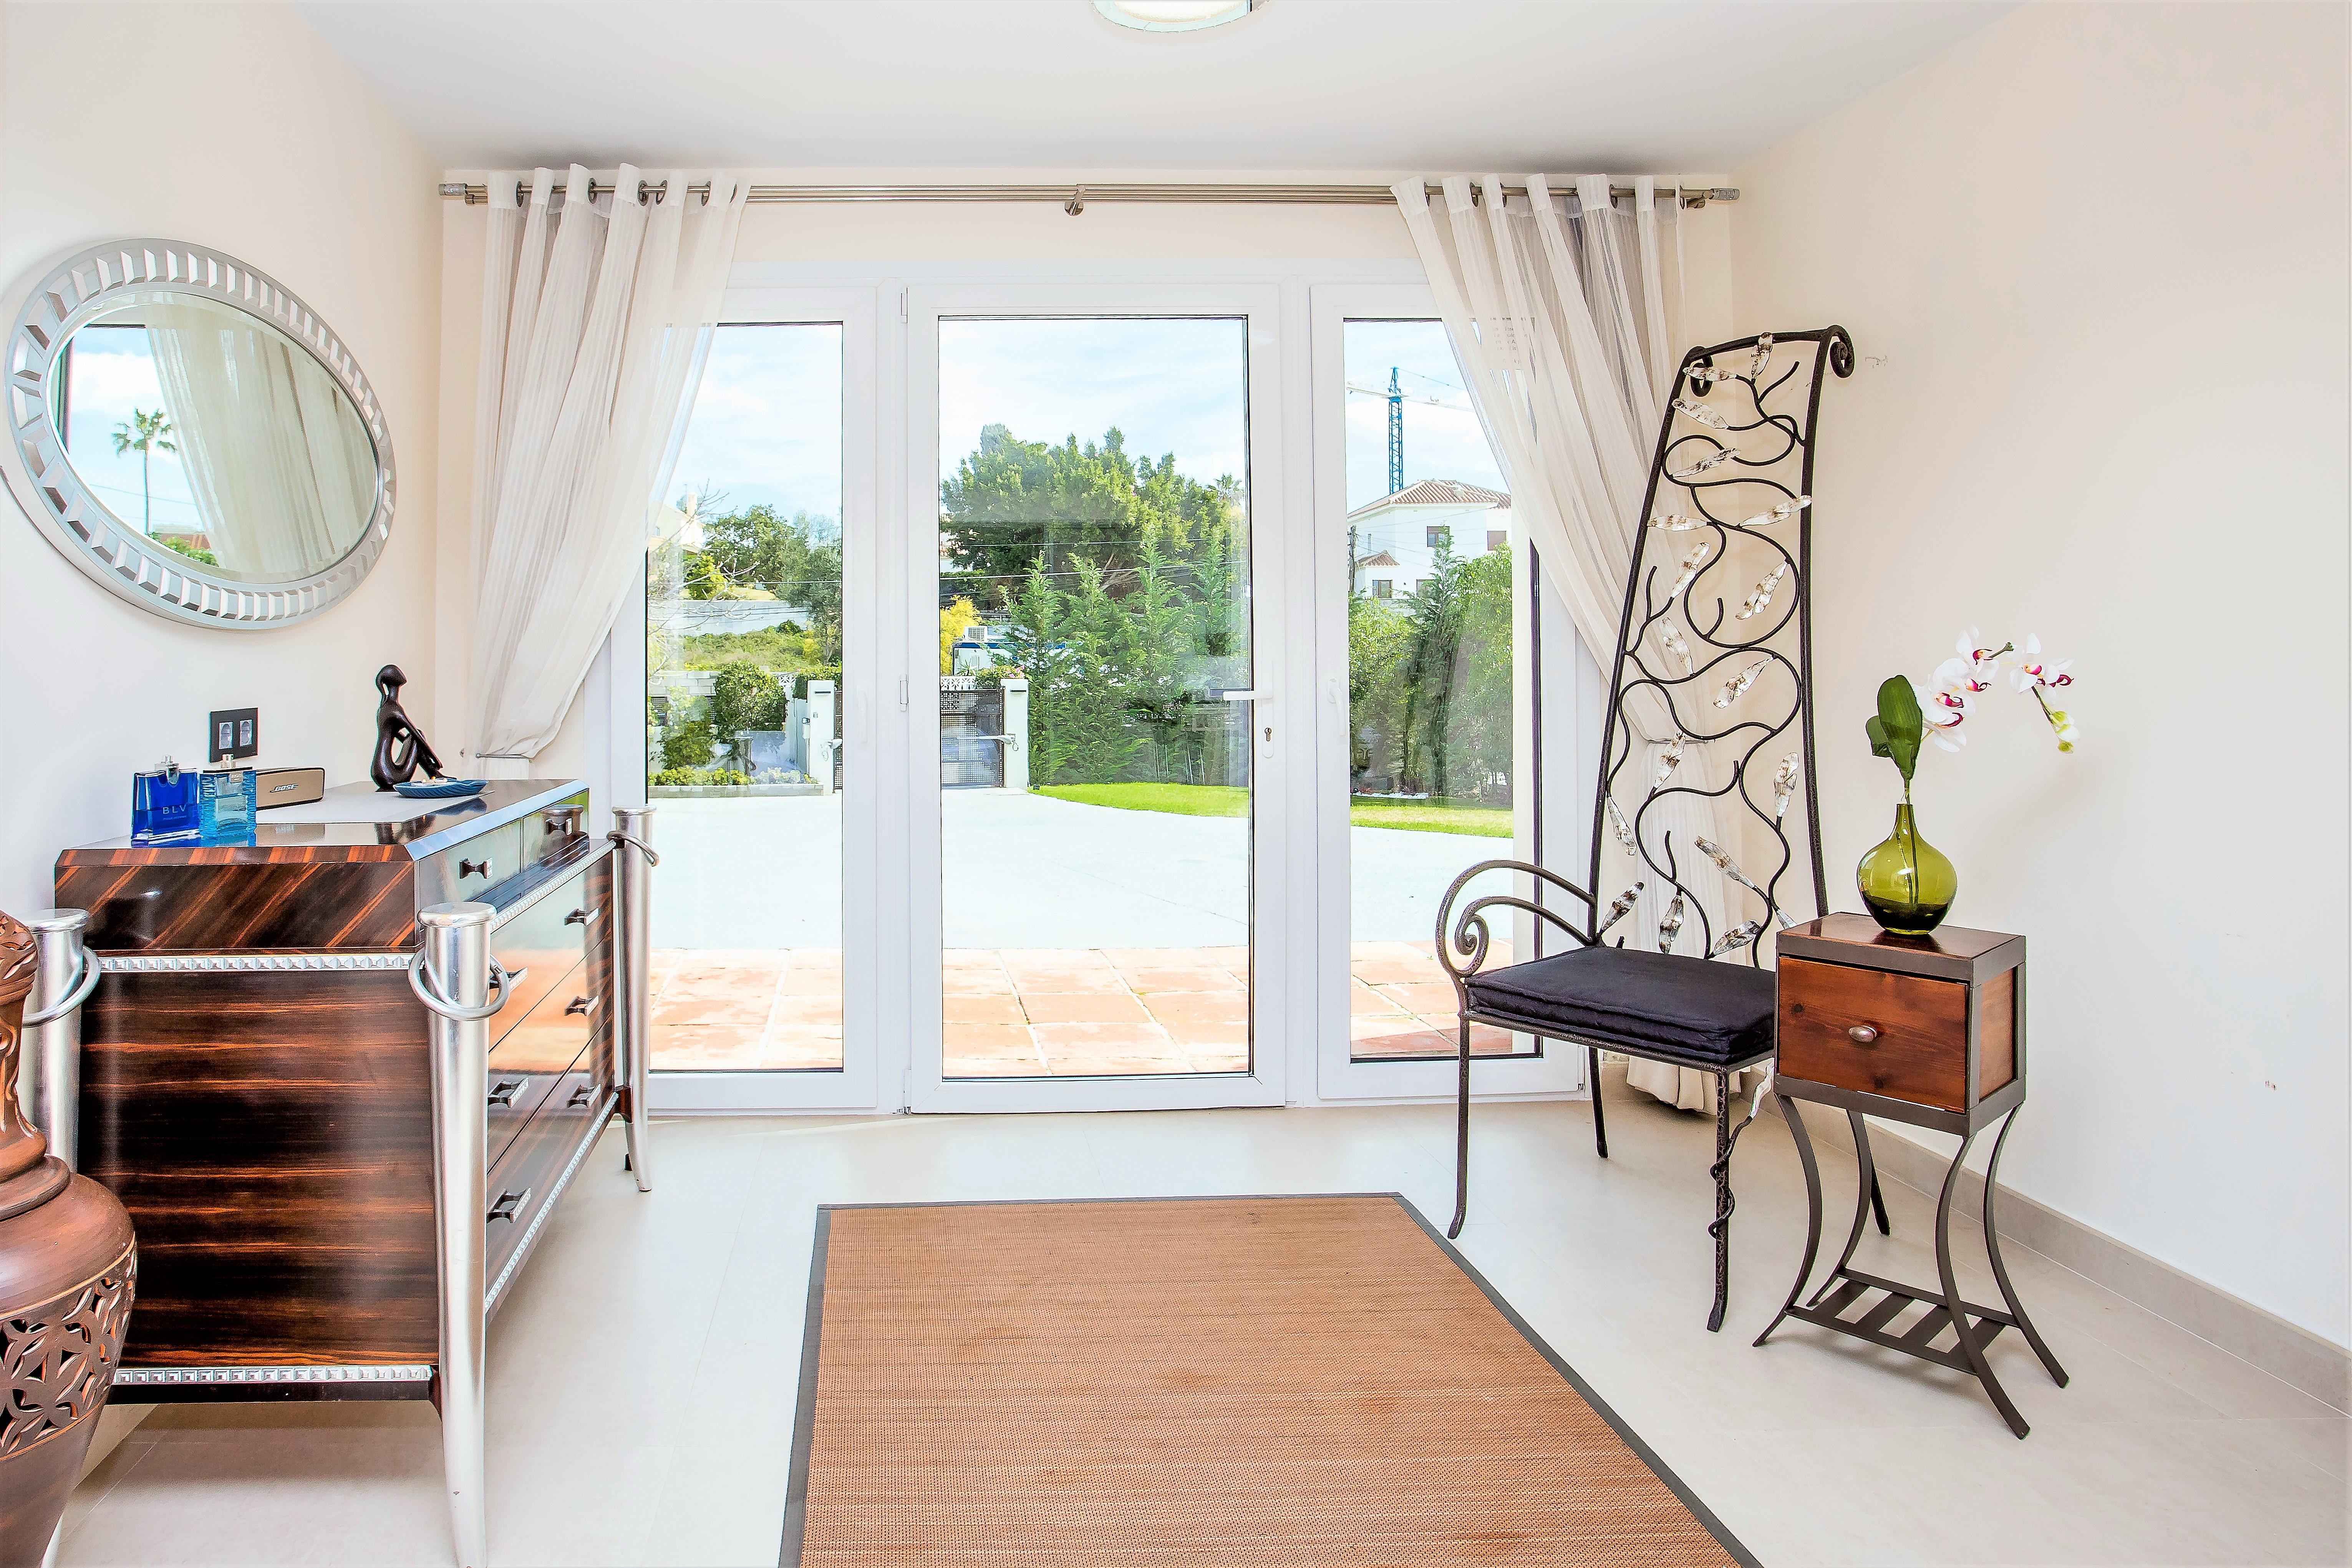 Apartment 8 Bedroom VILLA BY PUERTO BANUS   SEA 5 min                                photo 20402234